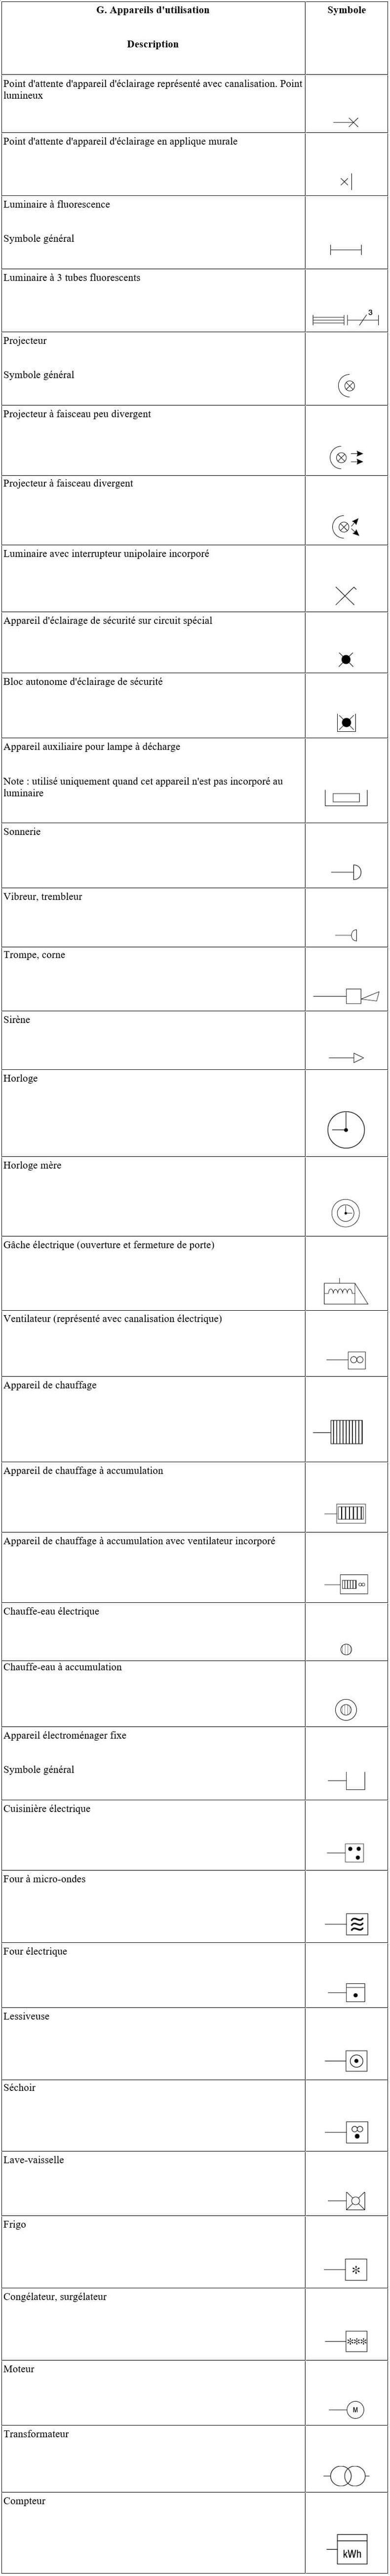 Symbole-Appareils d'utilisation